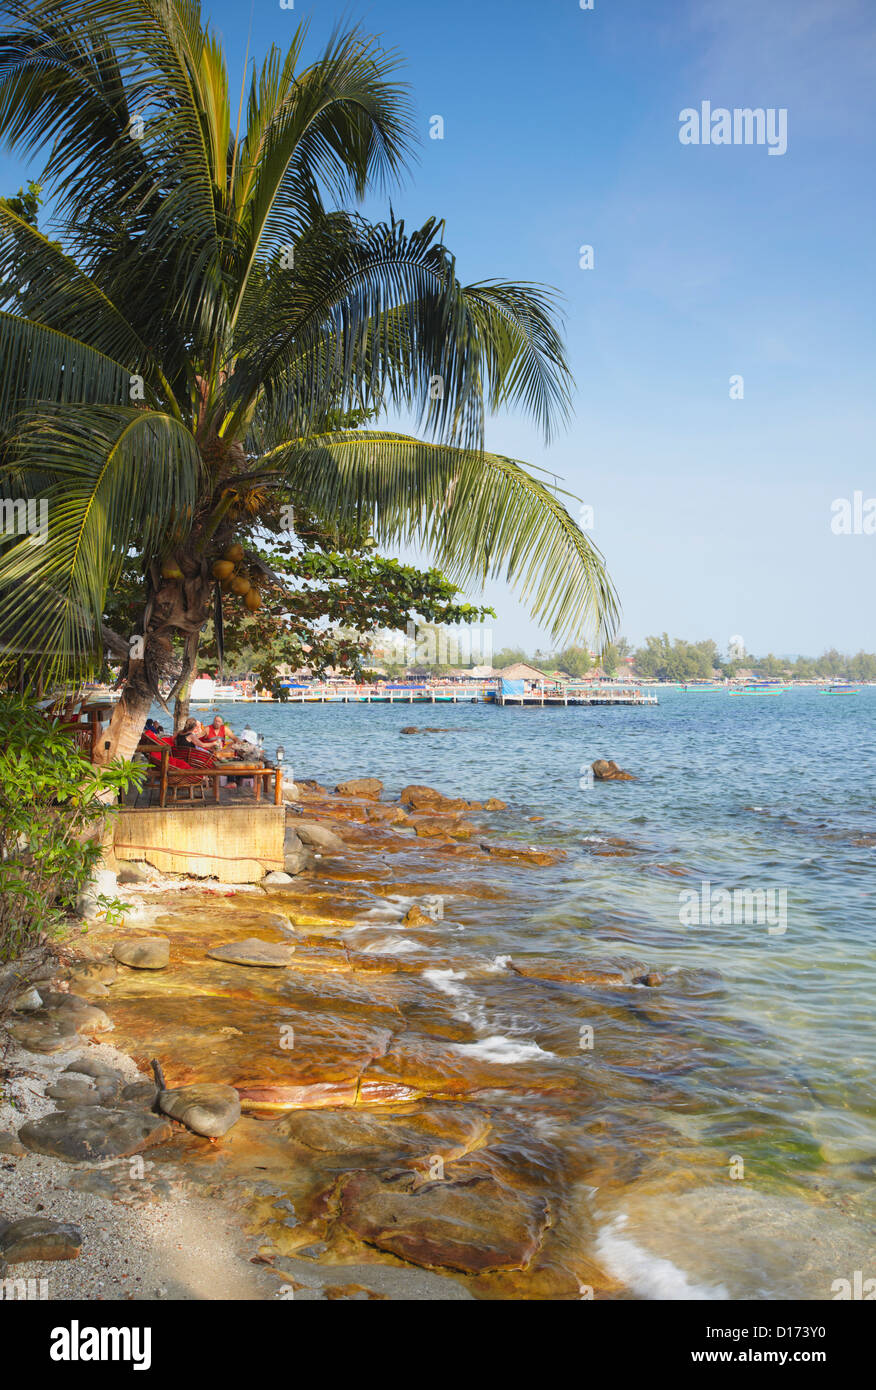 Ochheuteal Beach, Sihanoukville, Cambodia - Stock Image